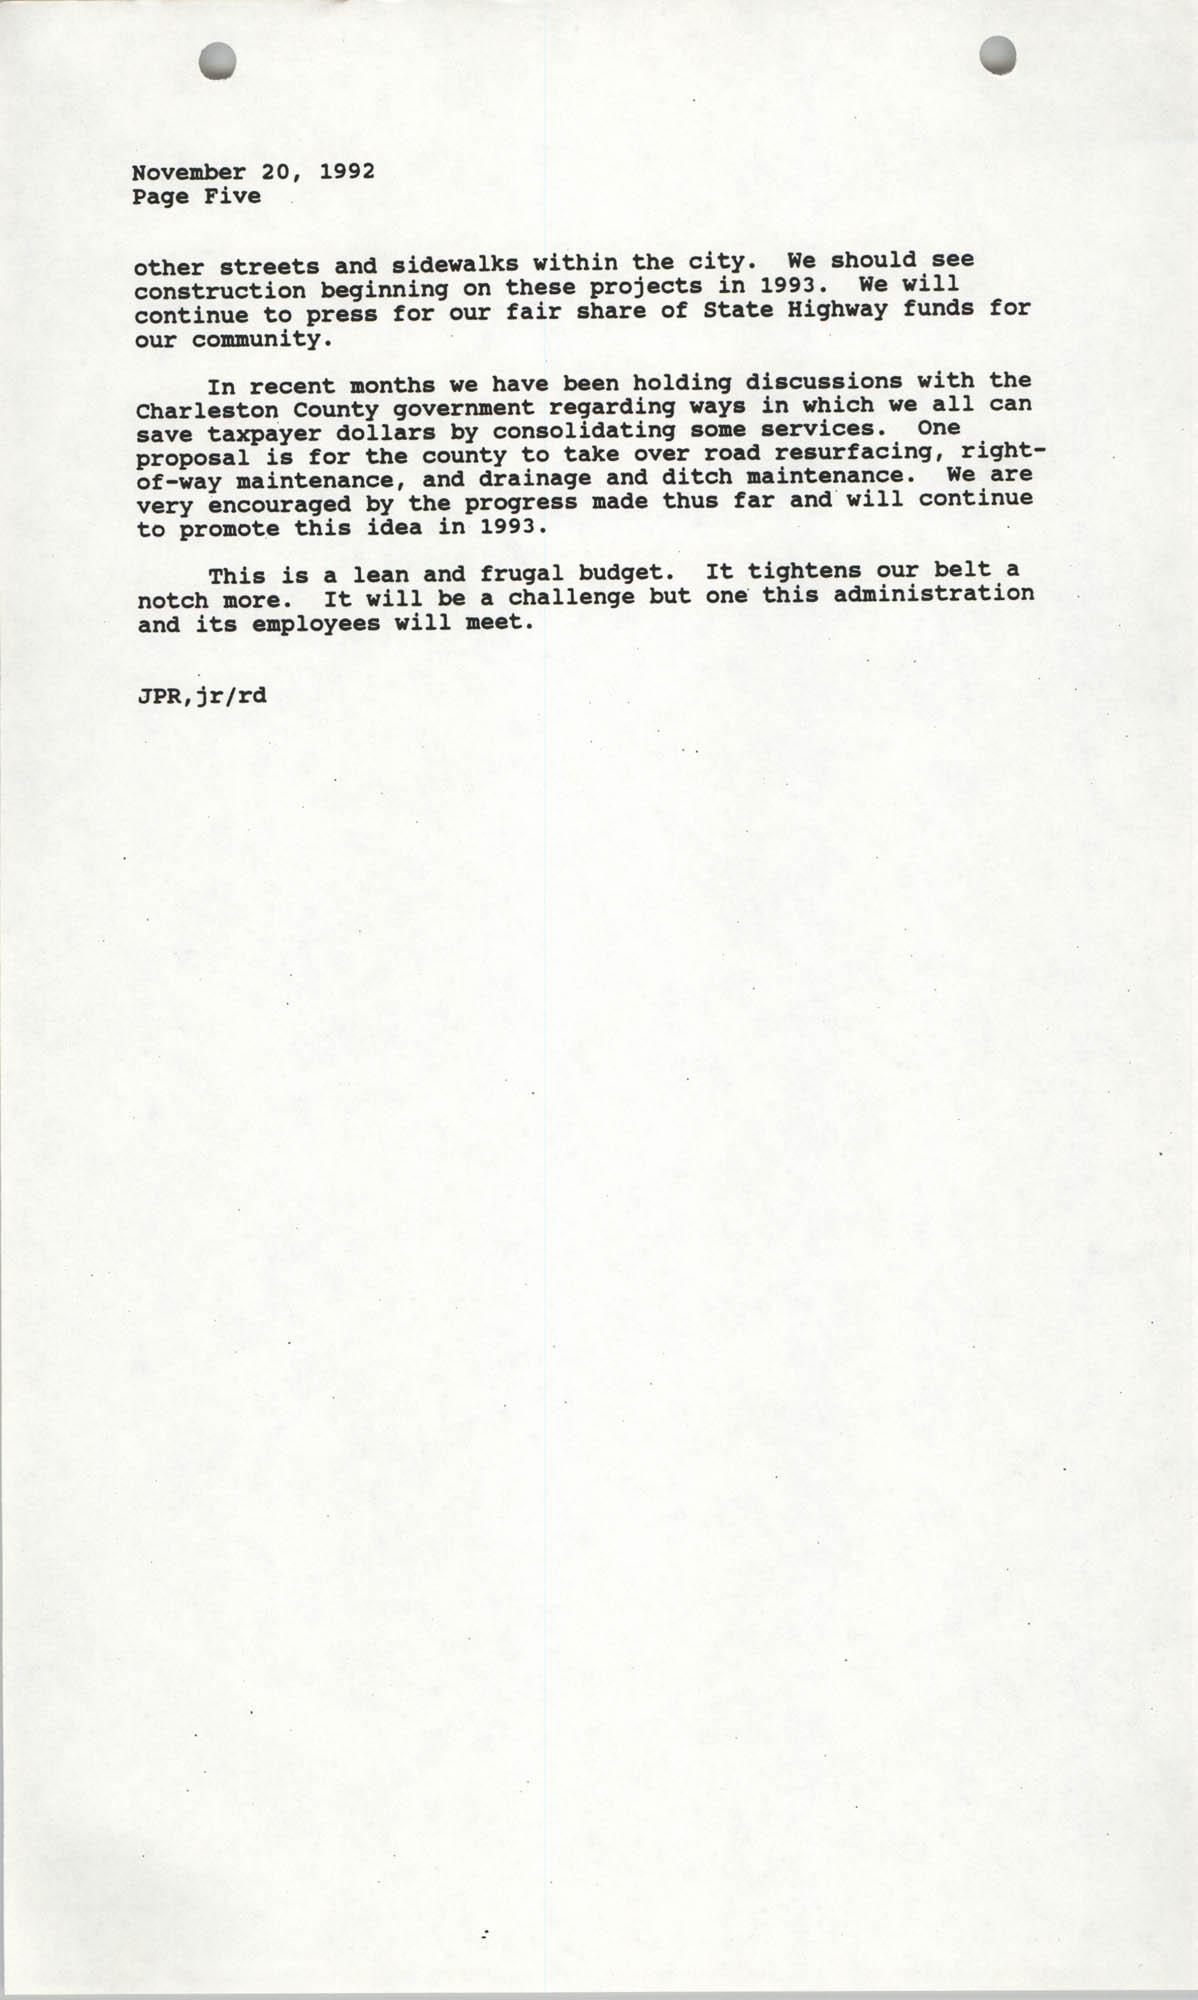 The City Council of Charleston, South Carolina, 1993 Budget, Page 5